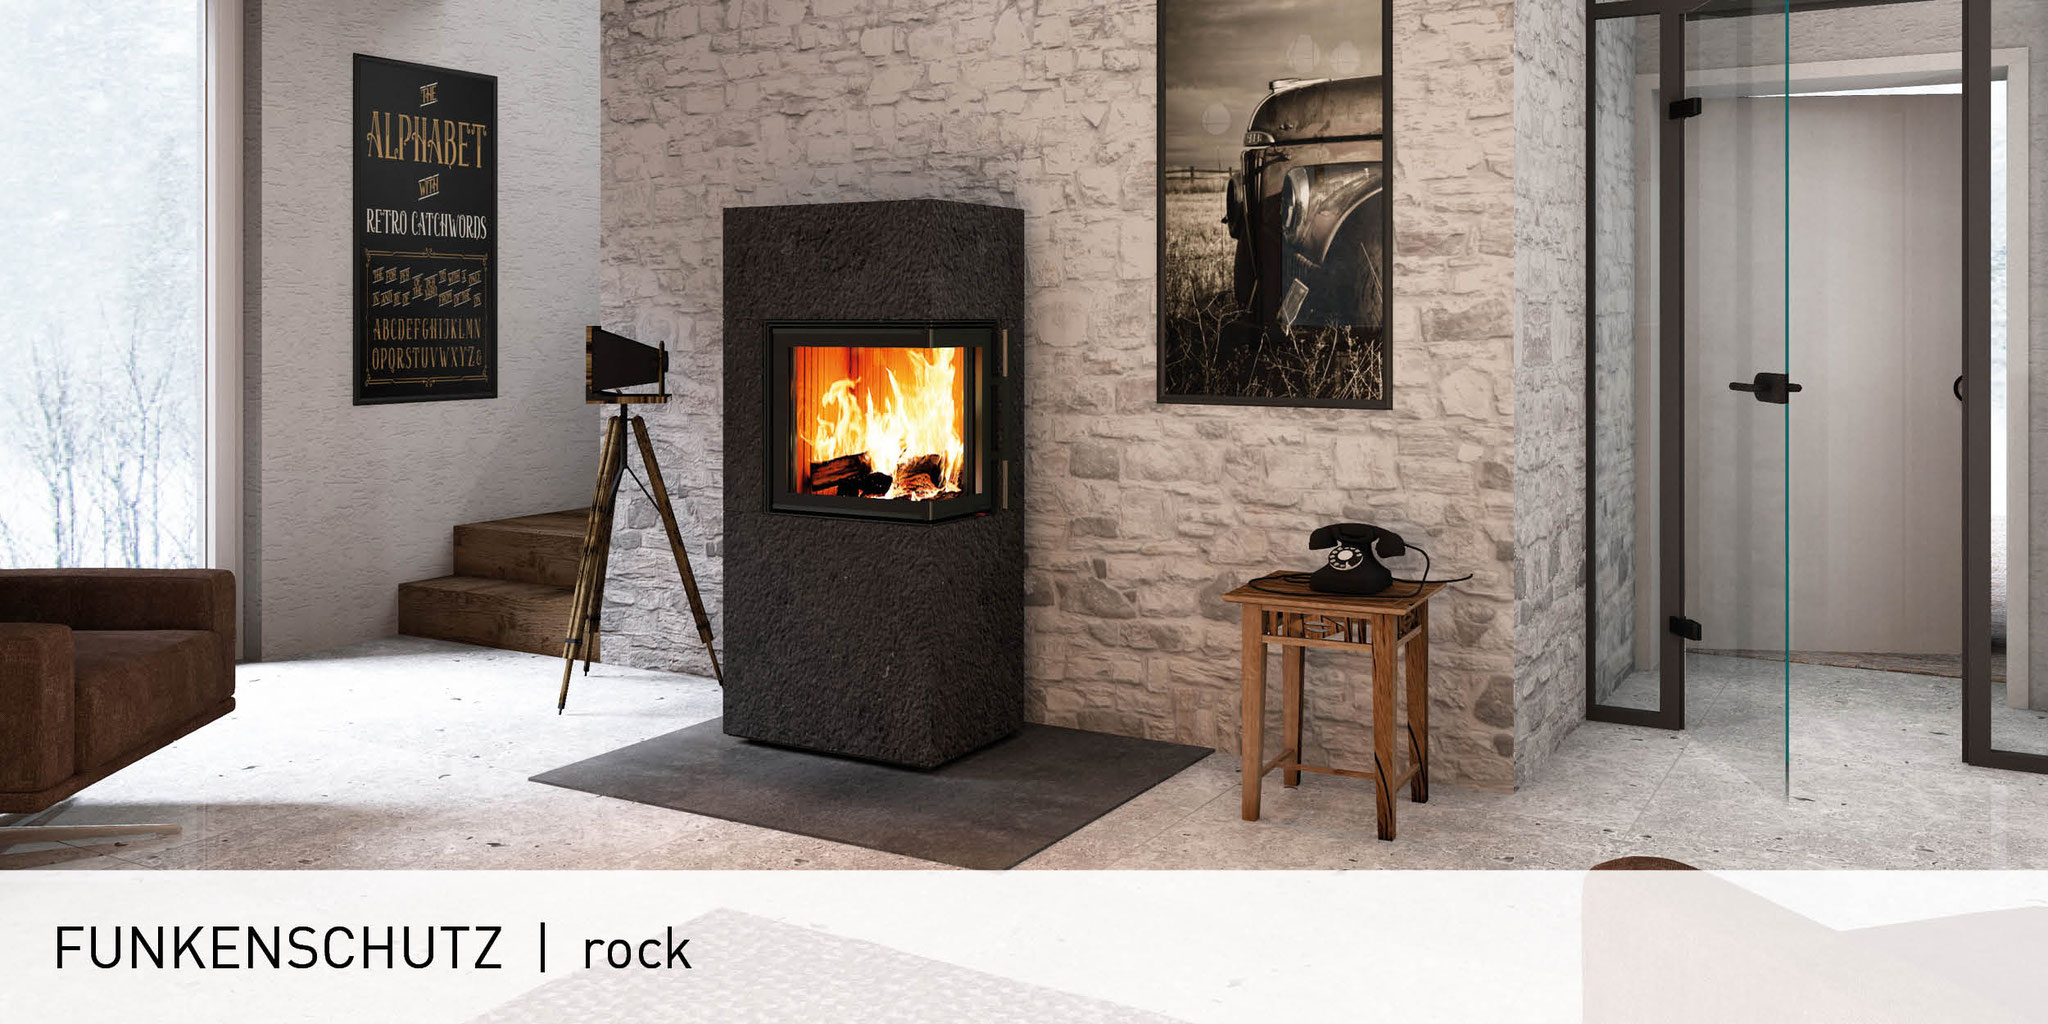 Funkenschutzplatten Monolith Fire Inside Natursteinofen Natursteinofen Speicher Kaminofen Speicherfeuerstatten Heizkamine